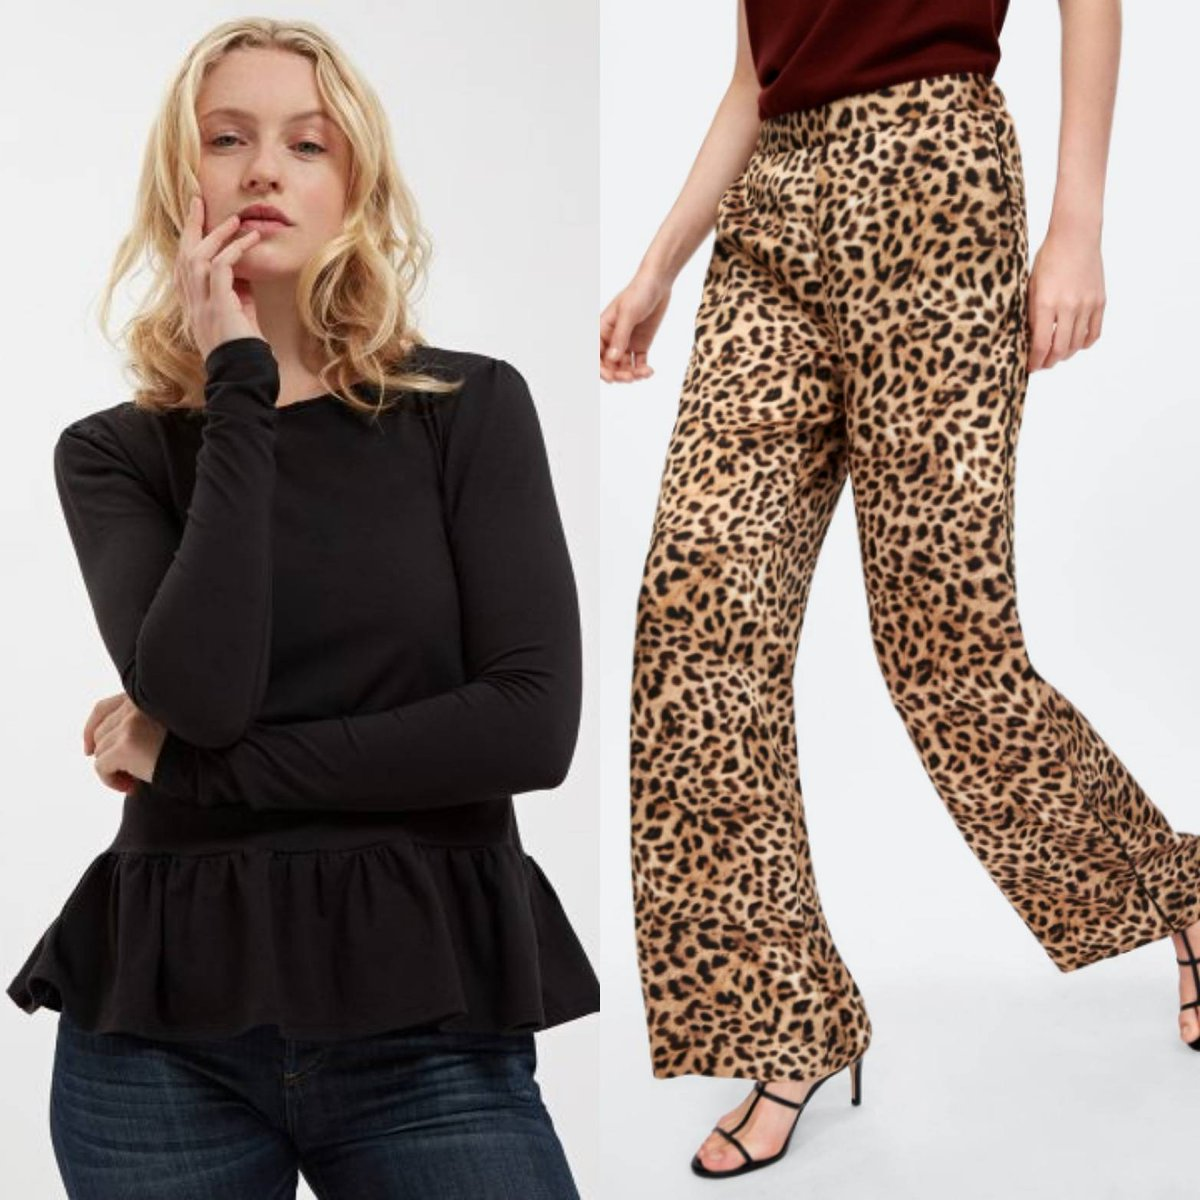 7dde8690 These Zara trousers are the perfect accompaniment to our LTD Peplum tee. # leopard #print #zara #peplum #tee #vreeland #idolpic.twitter.com/s9KSYbbxgA